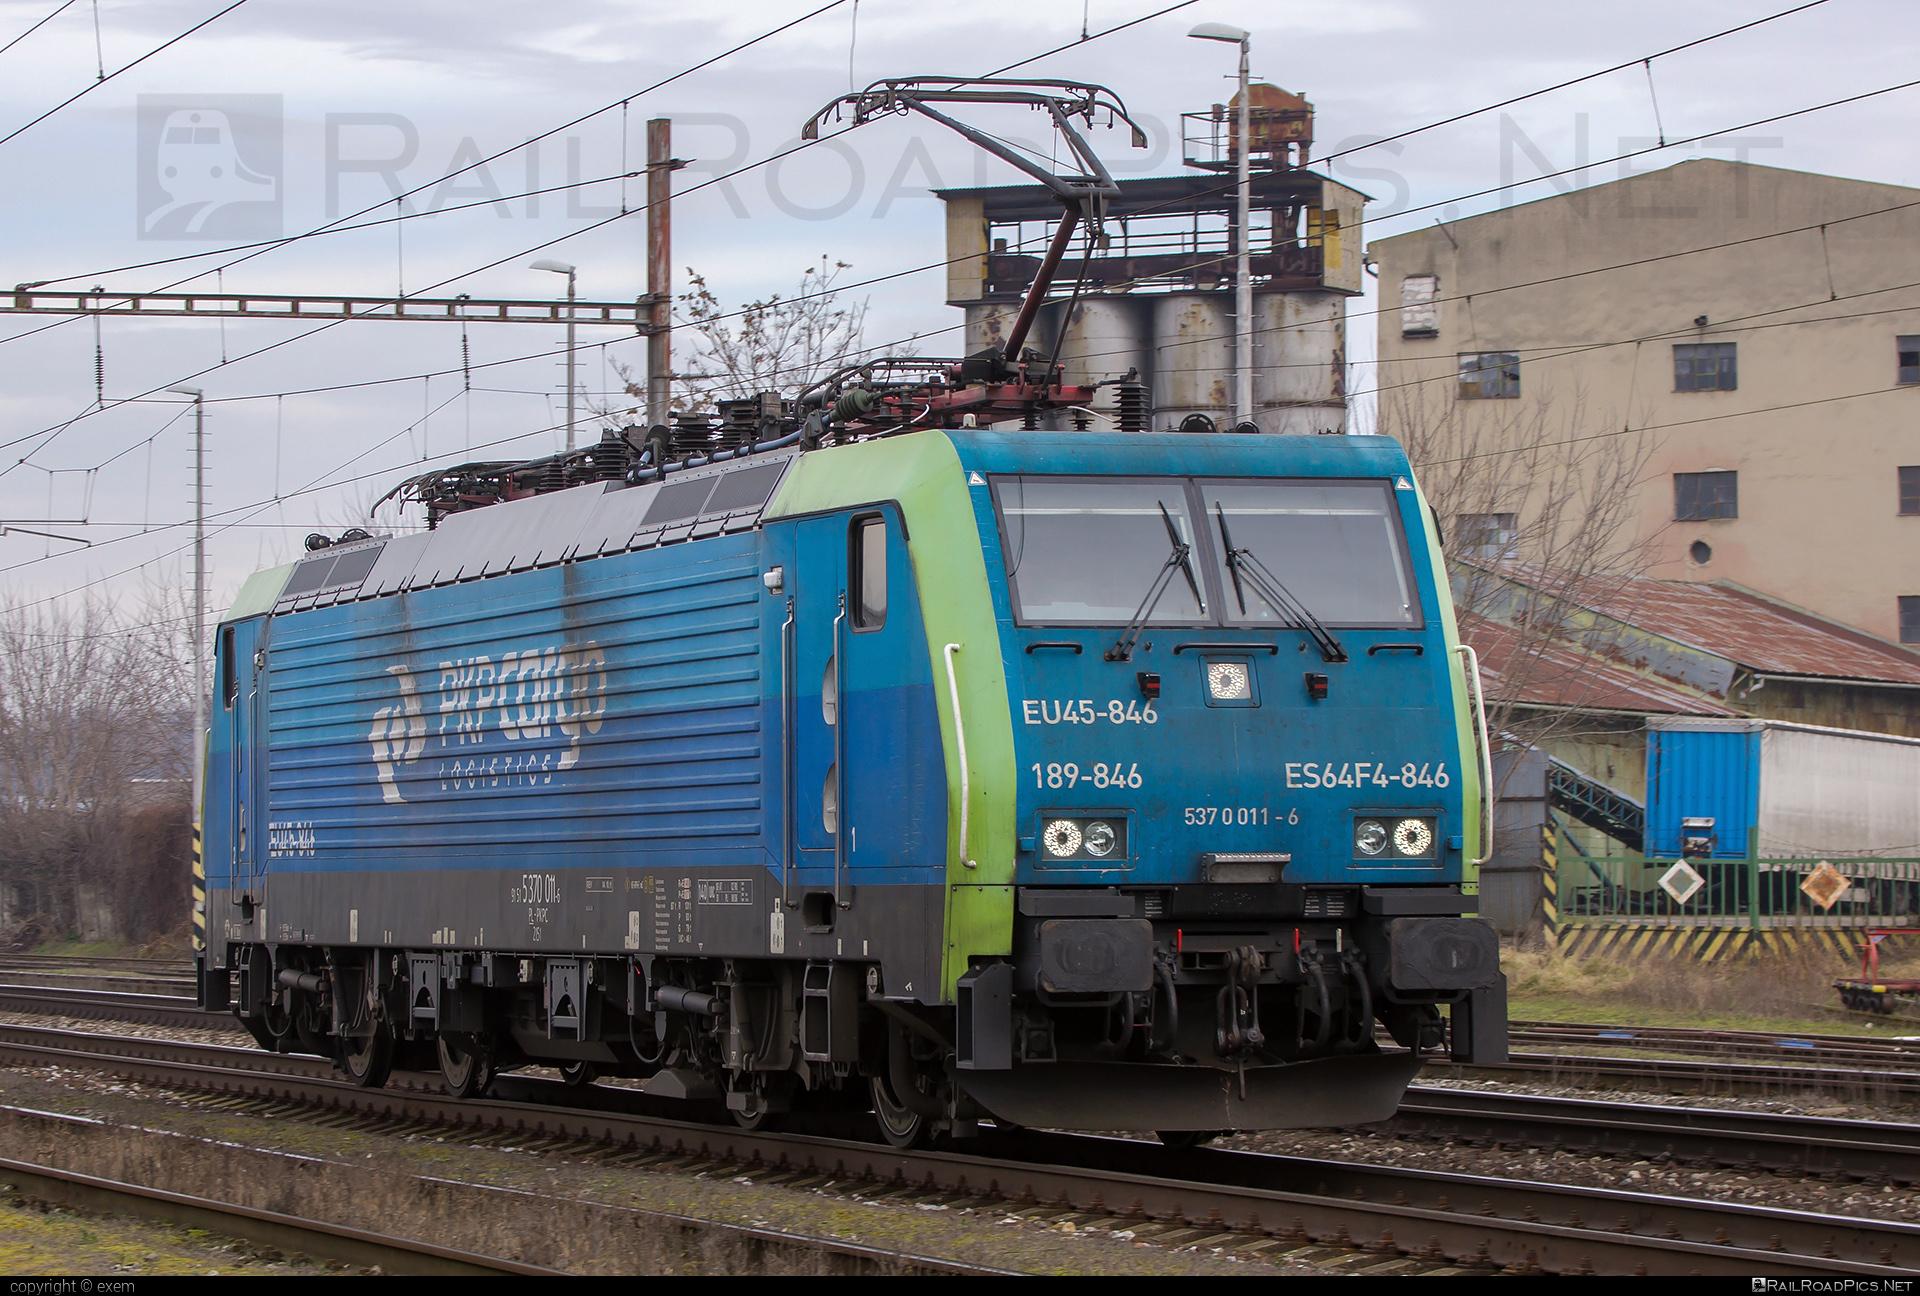 Siemens ES 64 F4 - 5370 011-6 operated by CENTRAL RAILWAYS s.r.o. #crw #es64 #es64f4 #eurosprinter #pkp #pkpcargo #pkpcargospolkaakcyjna #siemens #siemenses64 #siemenses64f4